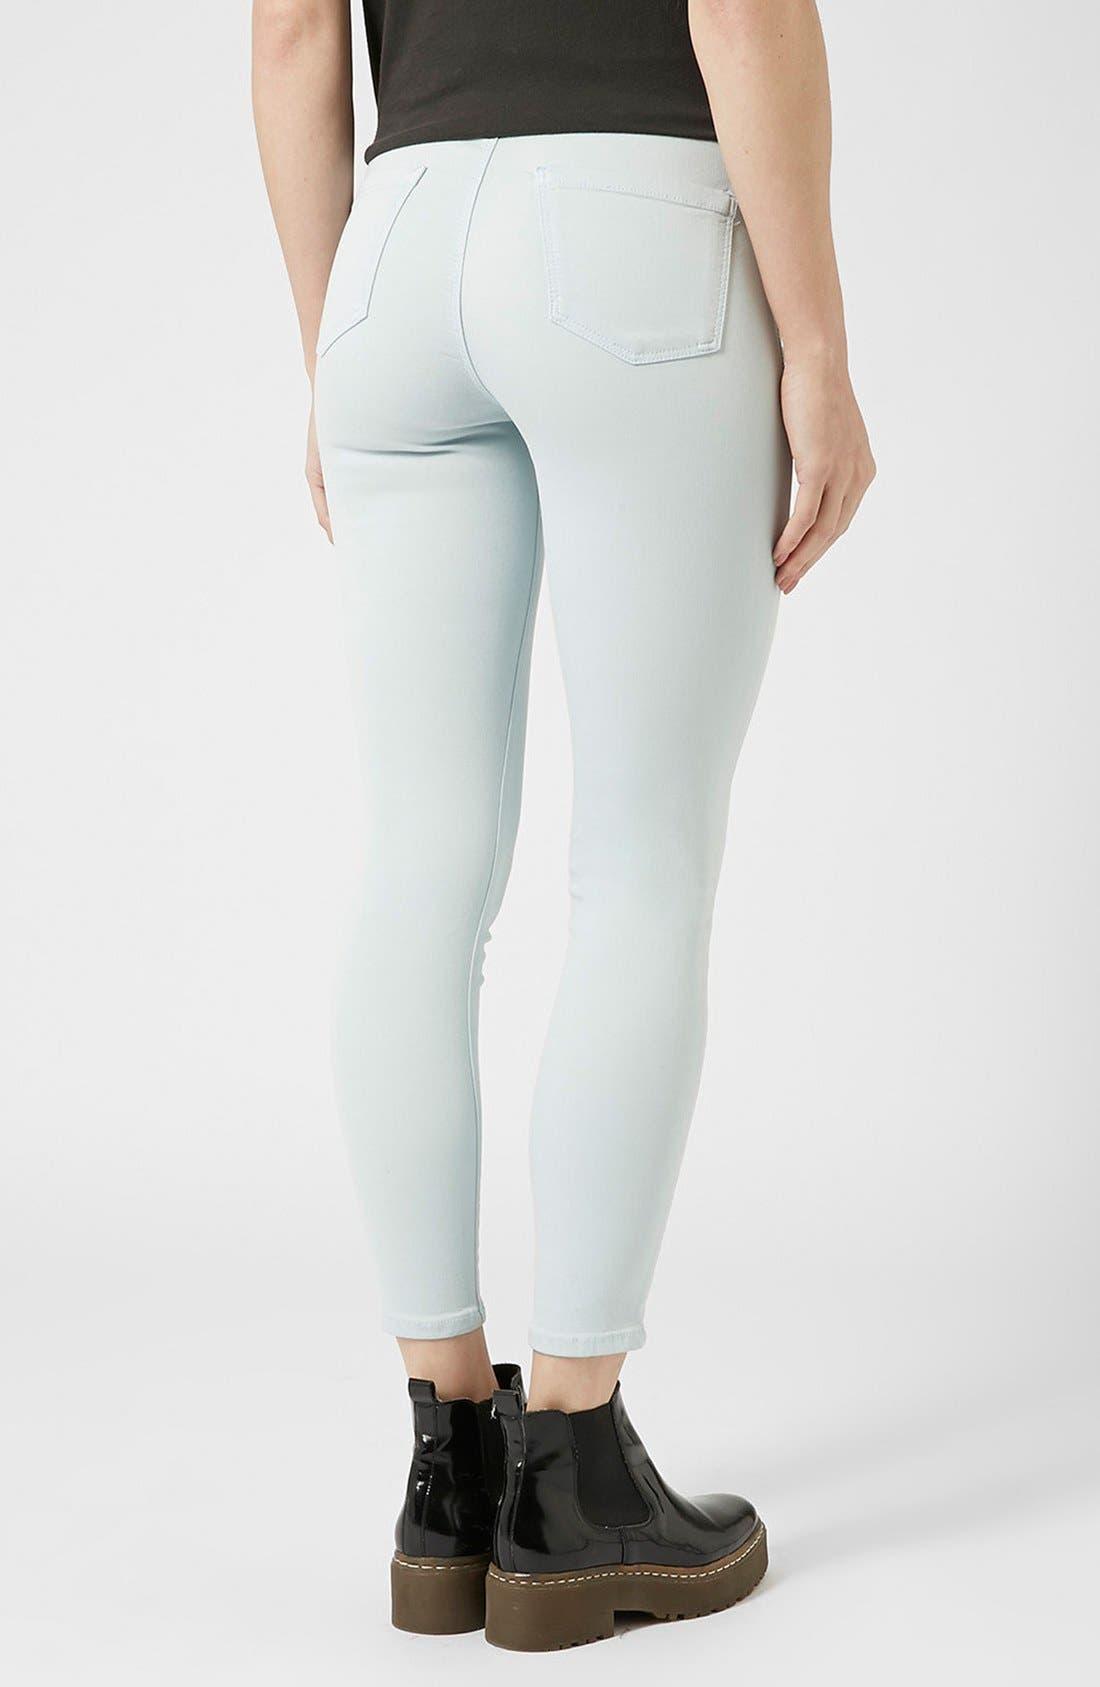 Alternate Image 2  - Topshop Moto 'Joni' High Rise Jeans (Light Blue) (Regular & Short)